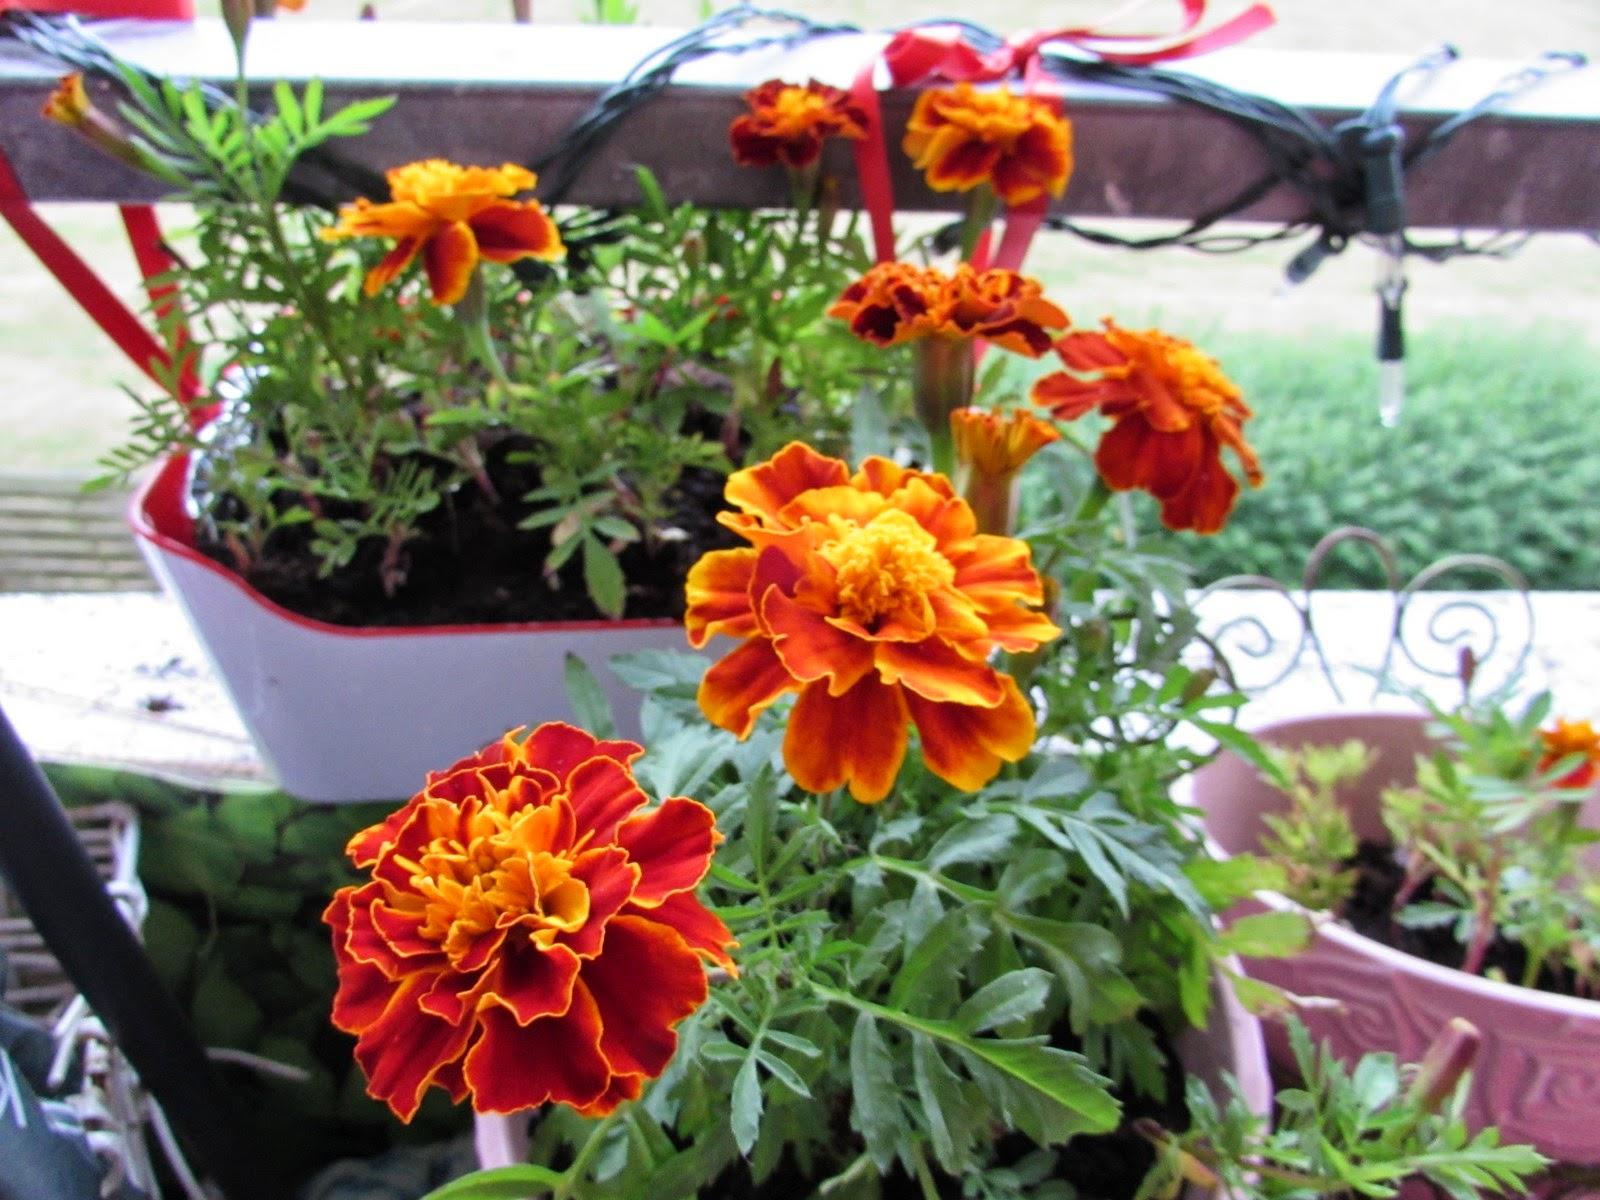 Karolines retro: det blomstrer stadig på min altan